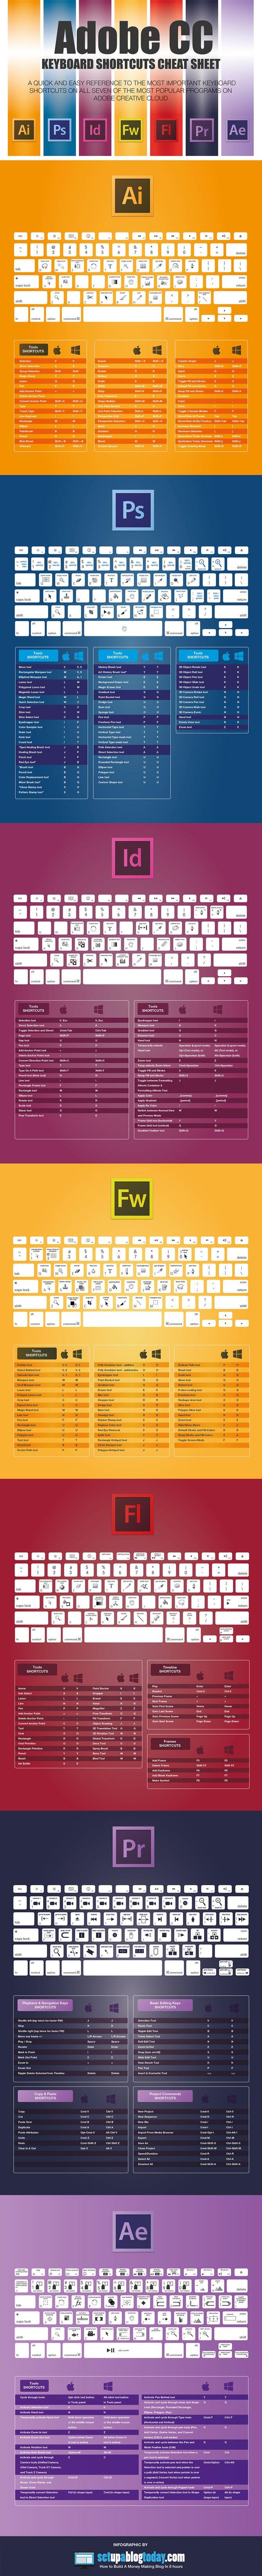 2015-ultimate-adobe-cc-keyboard-shortcuts-cheatsheet.jpg